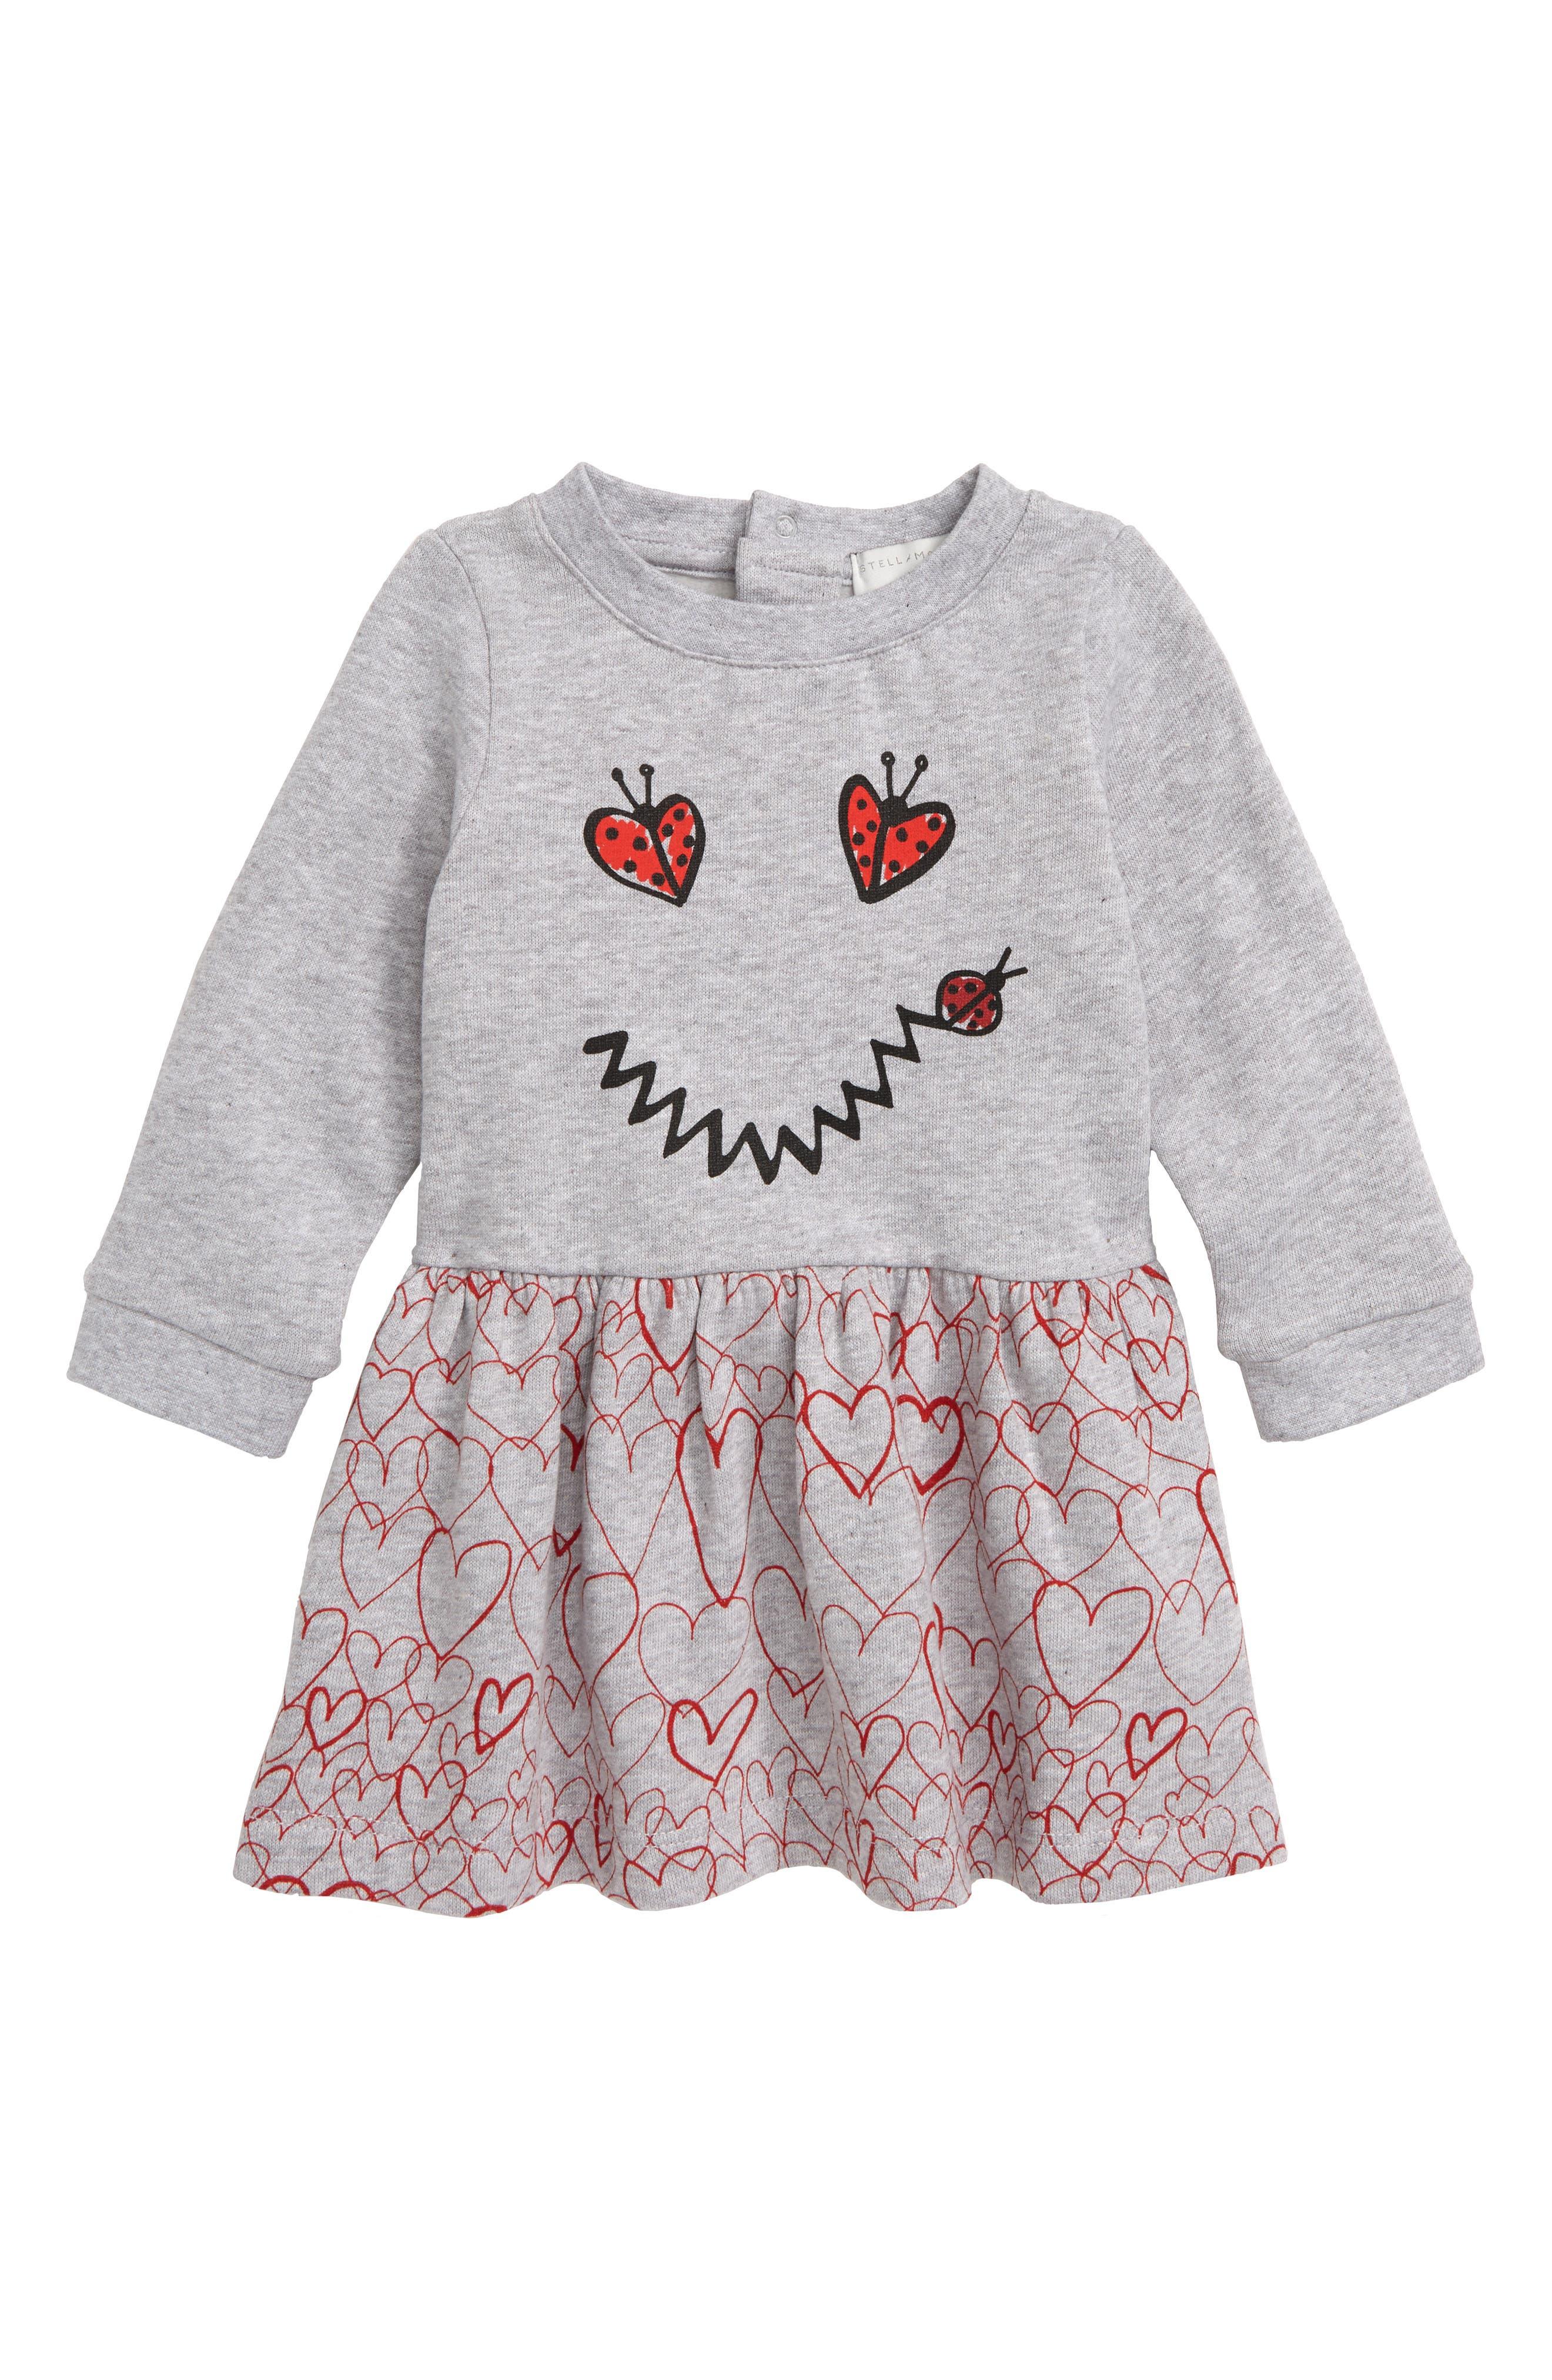 Infant Girls Stella Mccartney Kids Smiley Heart Dress Size 18M  Grey